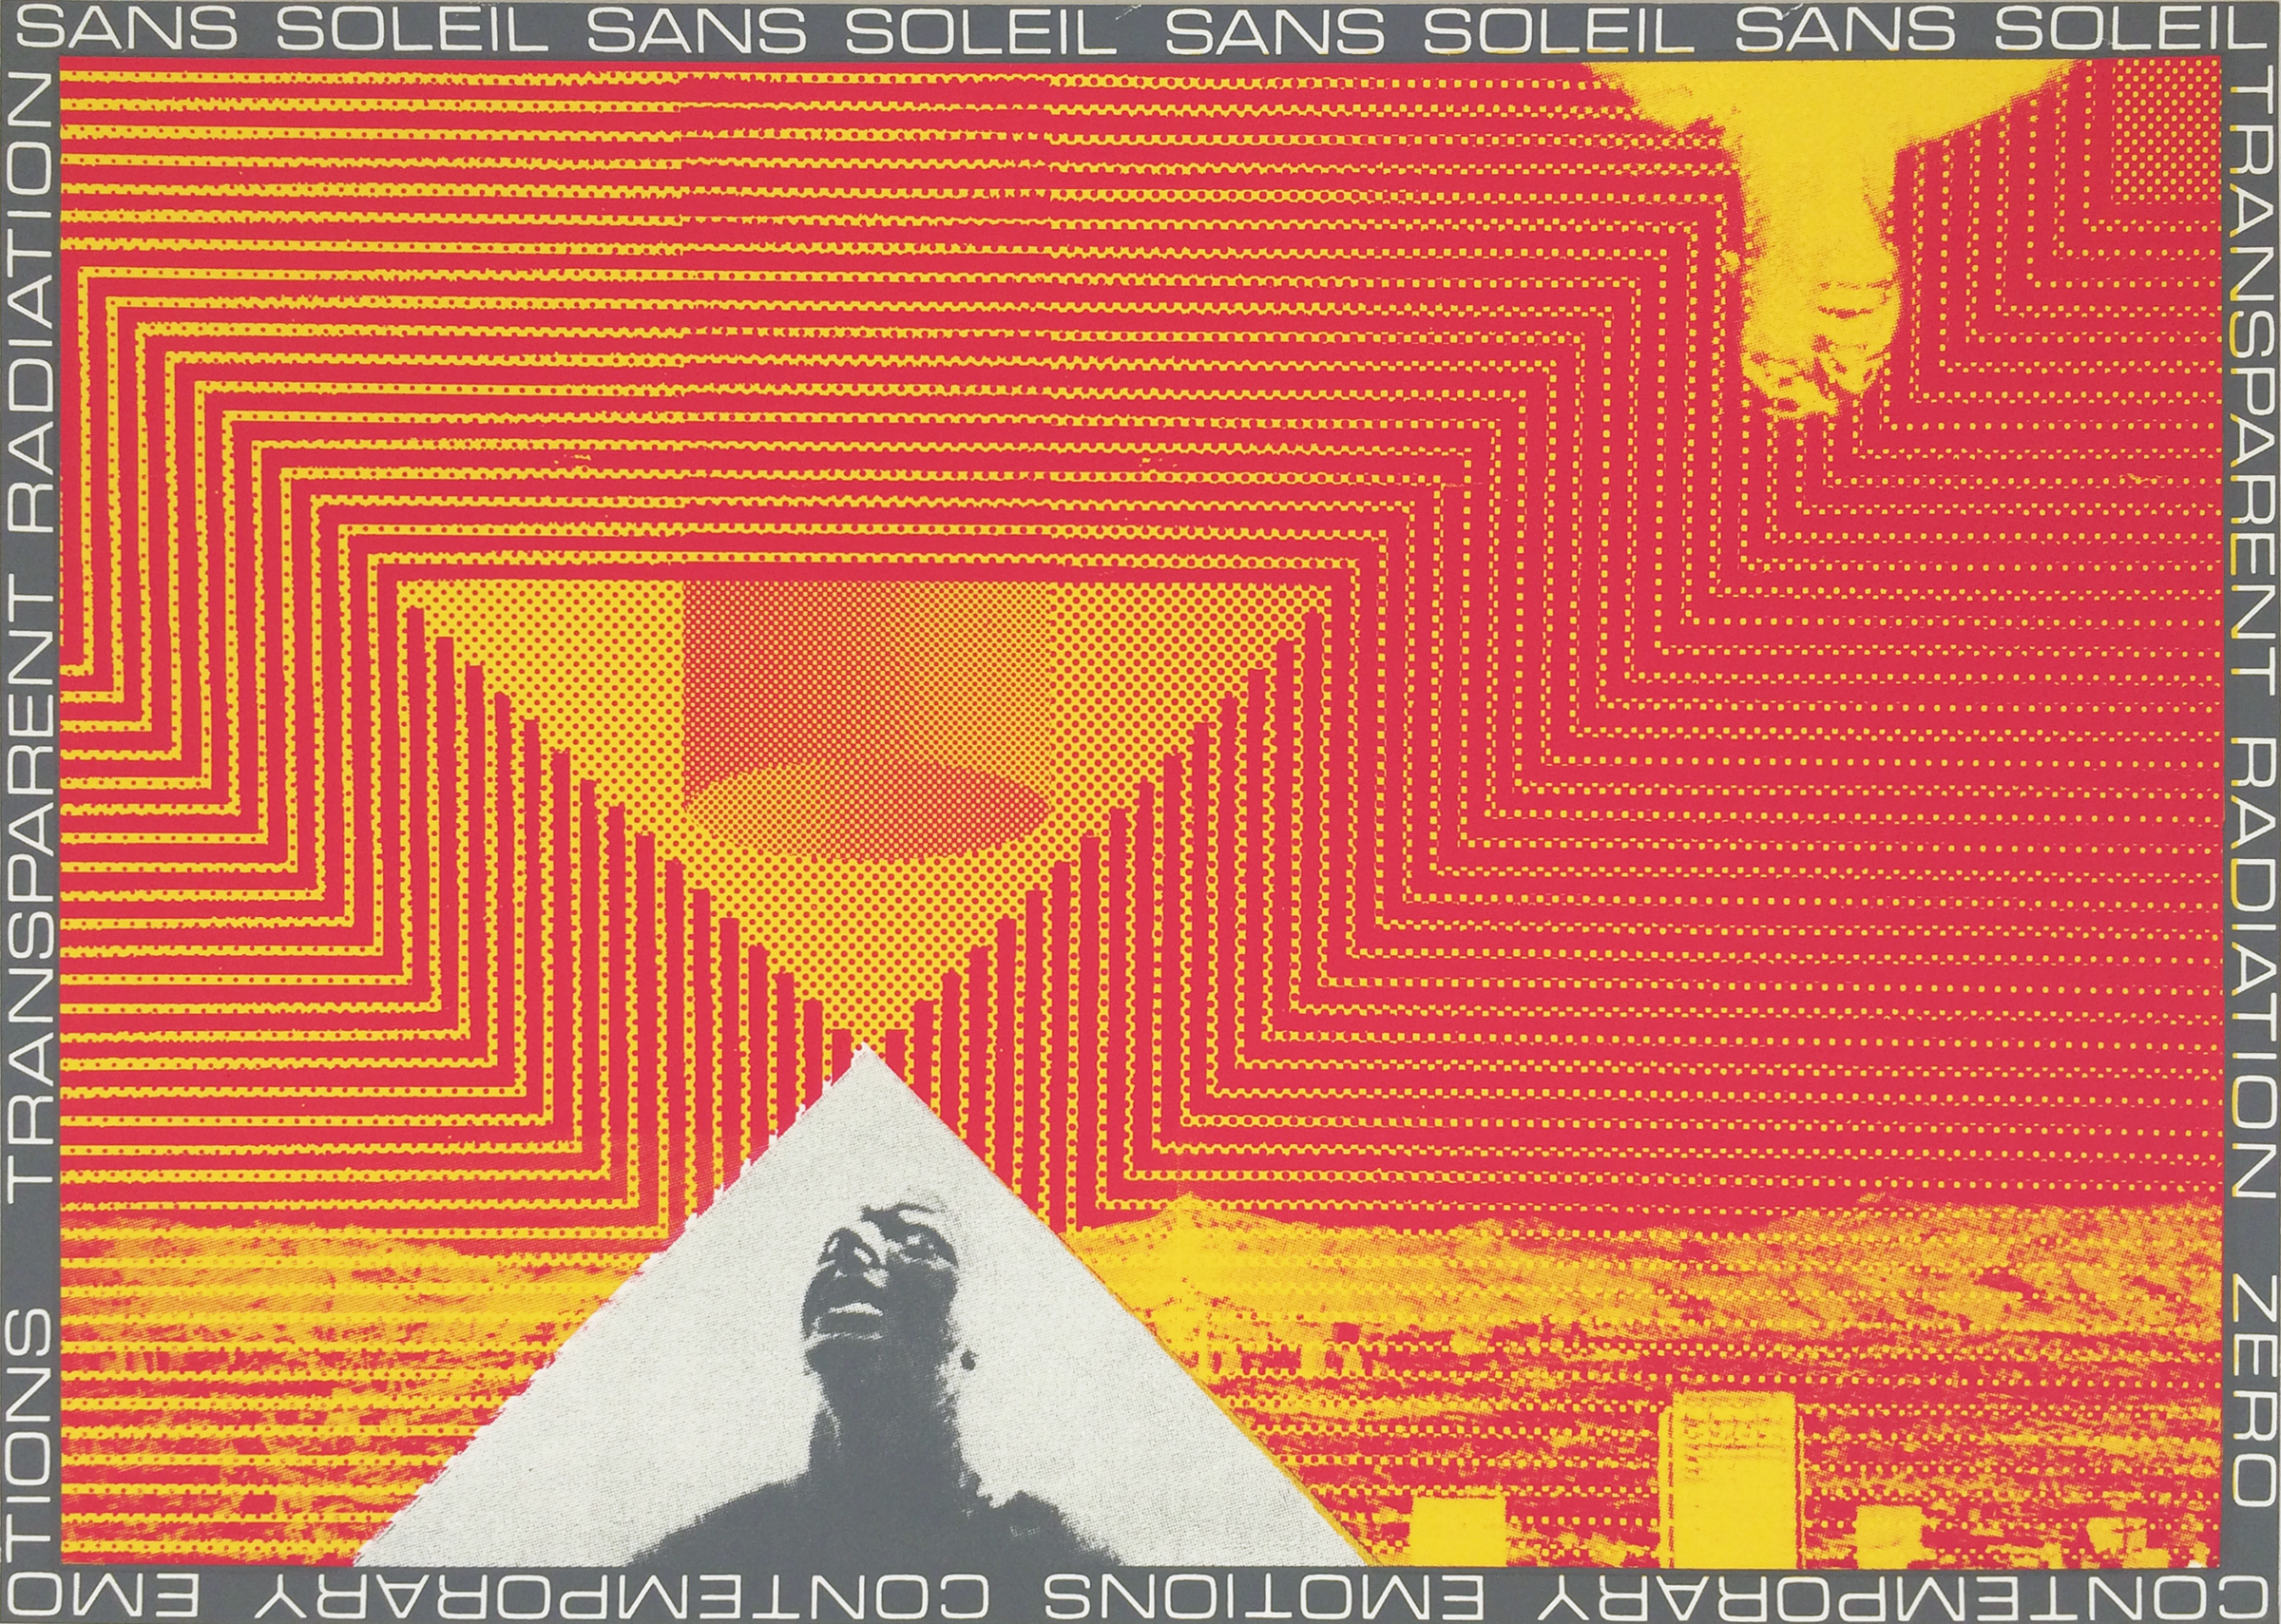 "GWENAËL RATTKE  Sans Soleil , 2012 unique silkscreen on paper, 19"" x 26.75"""